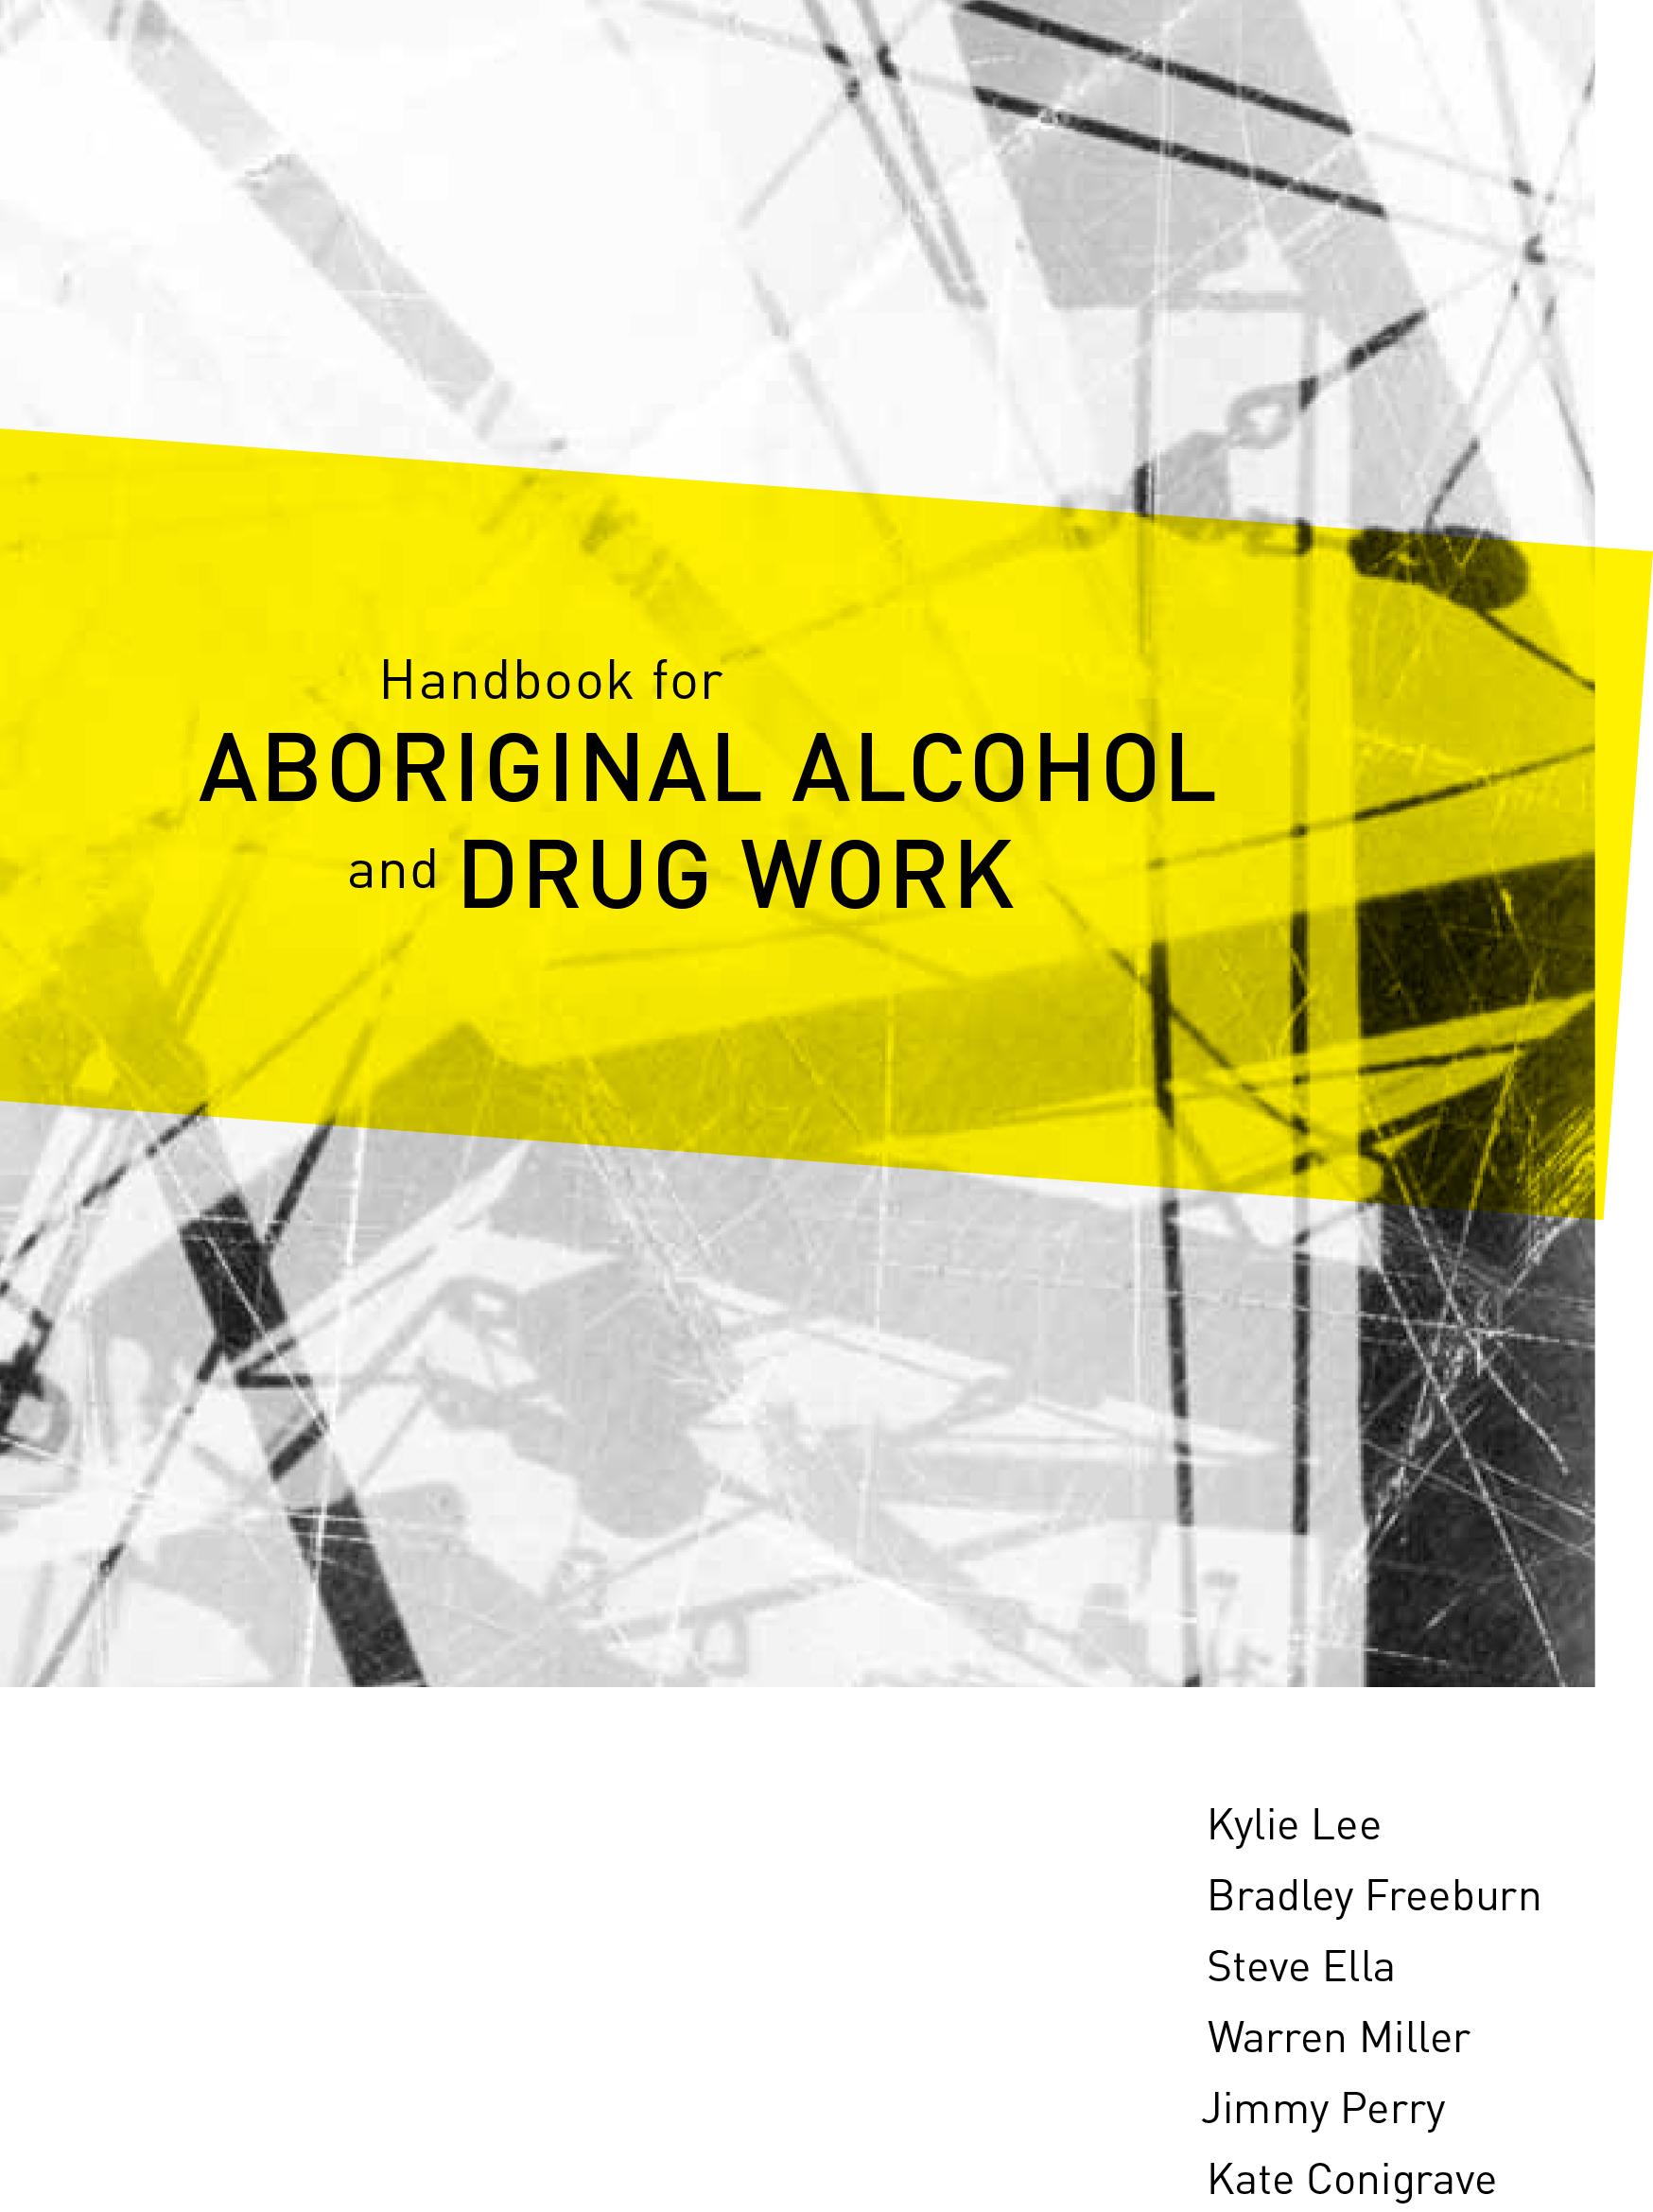 Handbook for Aboriginal Alcohol and Drug Work - University of Sydney (2012)